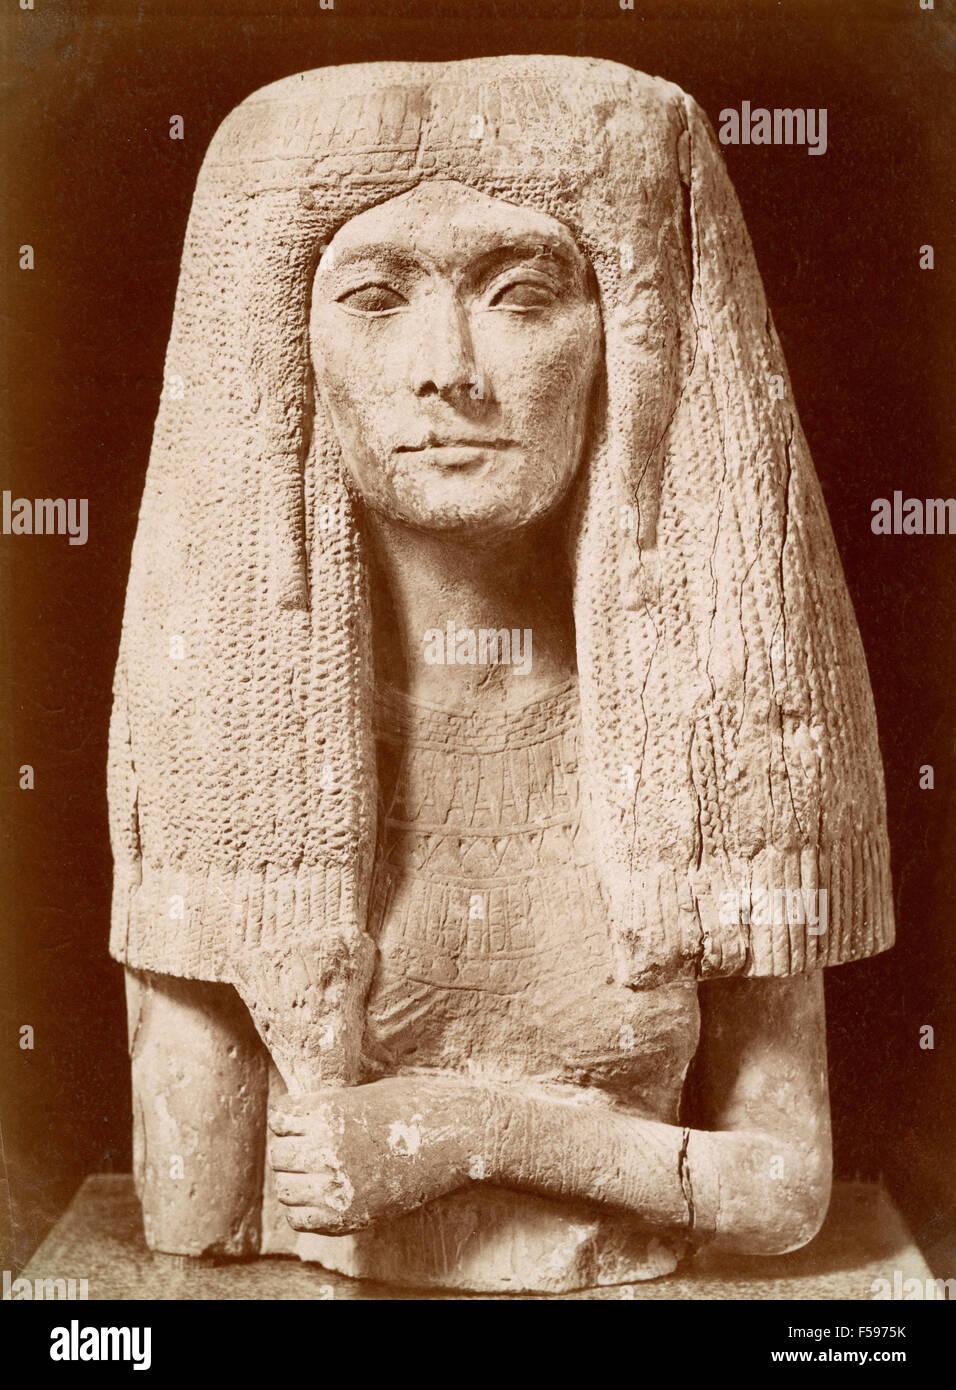 Busts of Egyptian woman - Stock Image